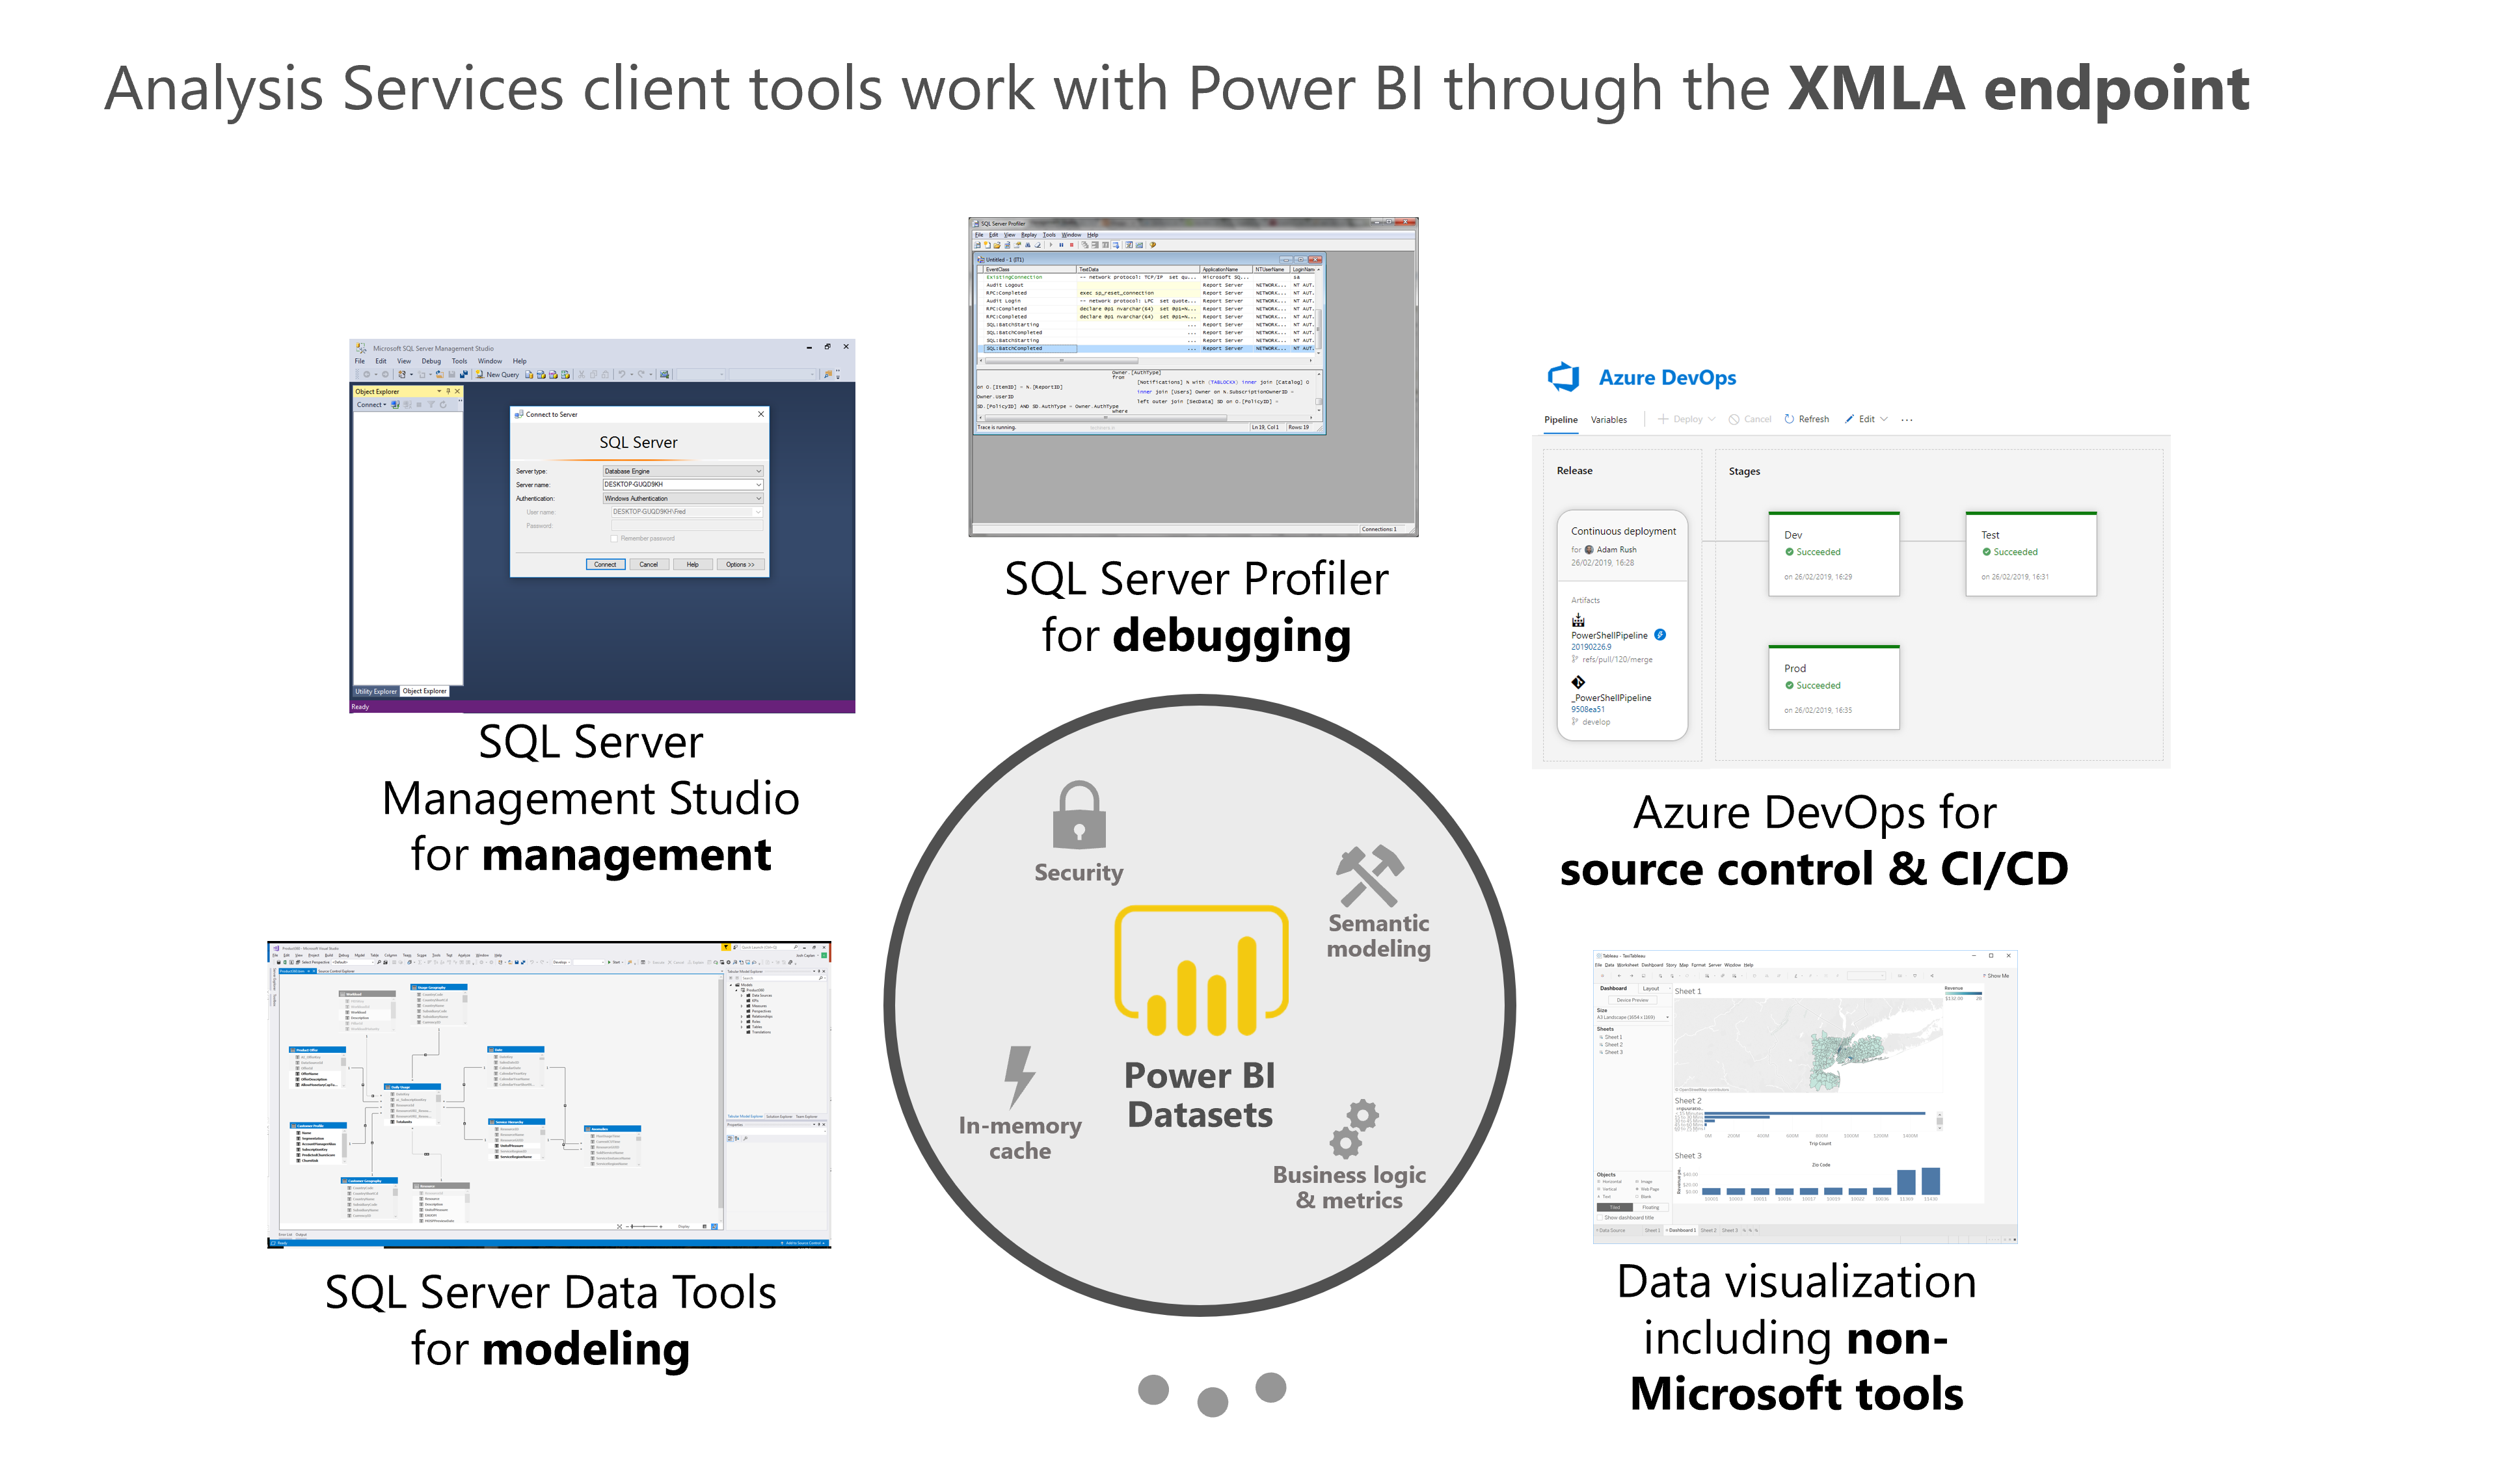 Power BI XMLA